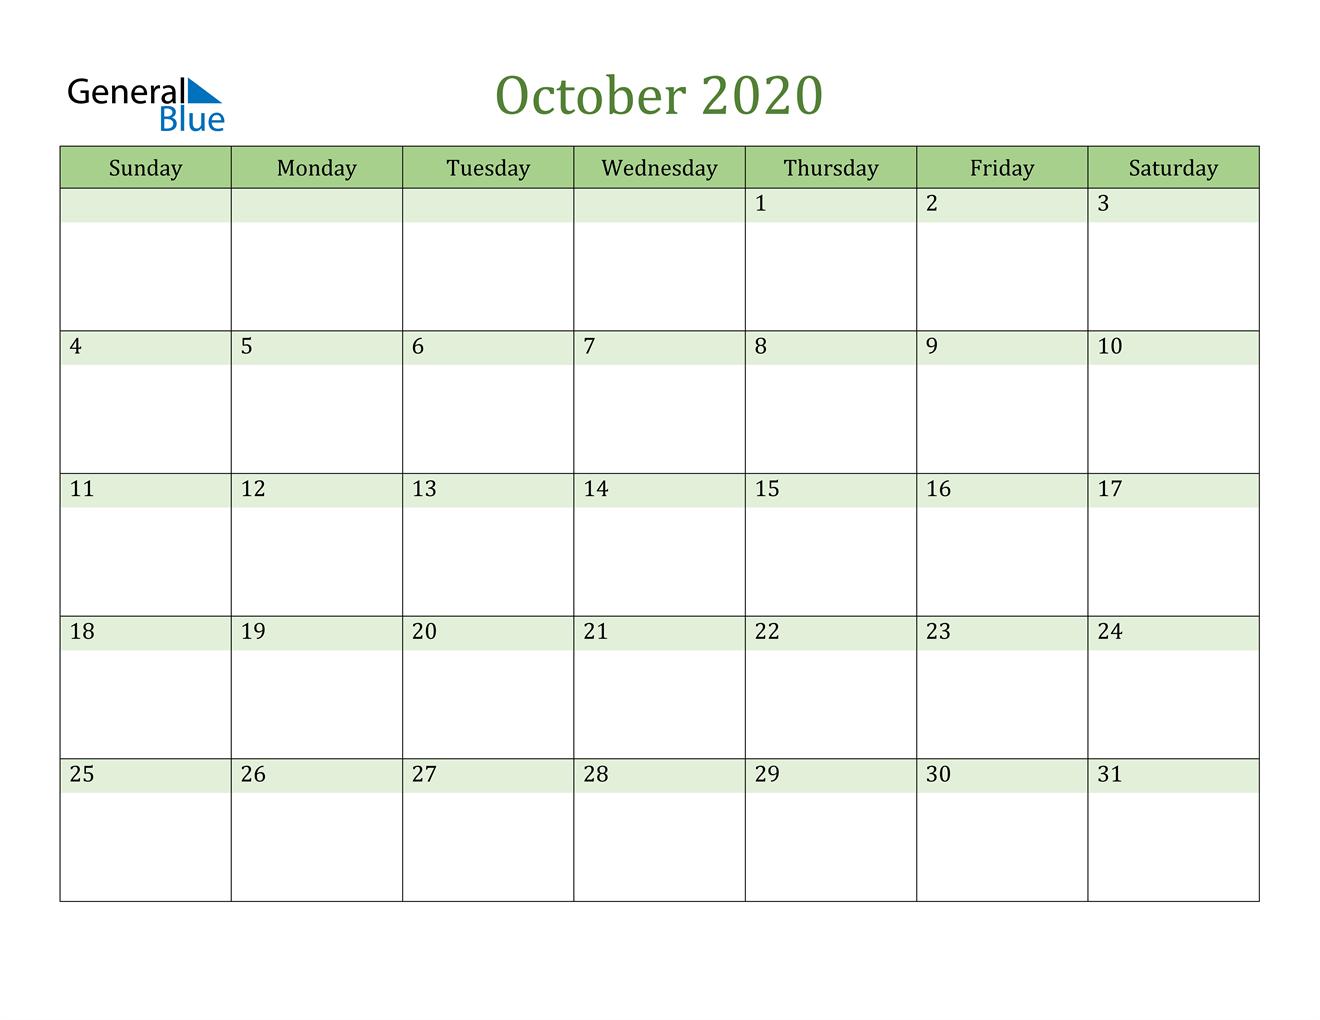 Image of October 2020 Cool and Relaxing Green Calendar Calendar